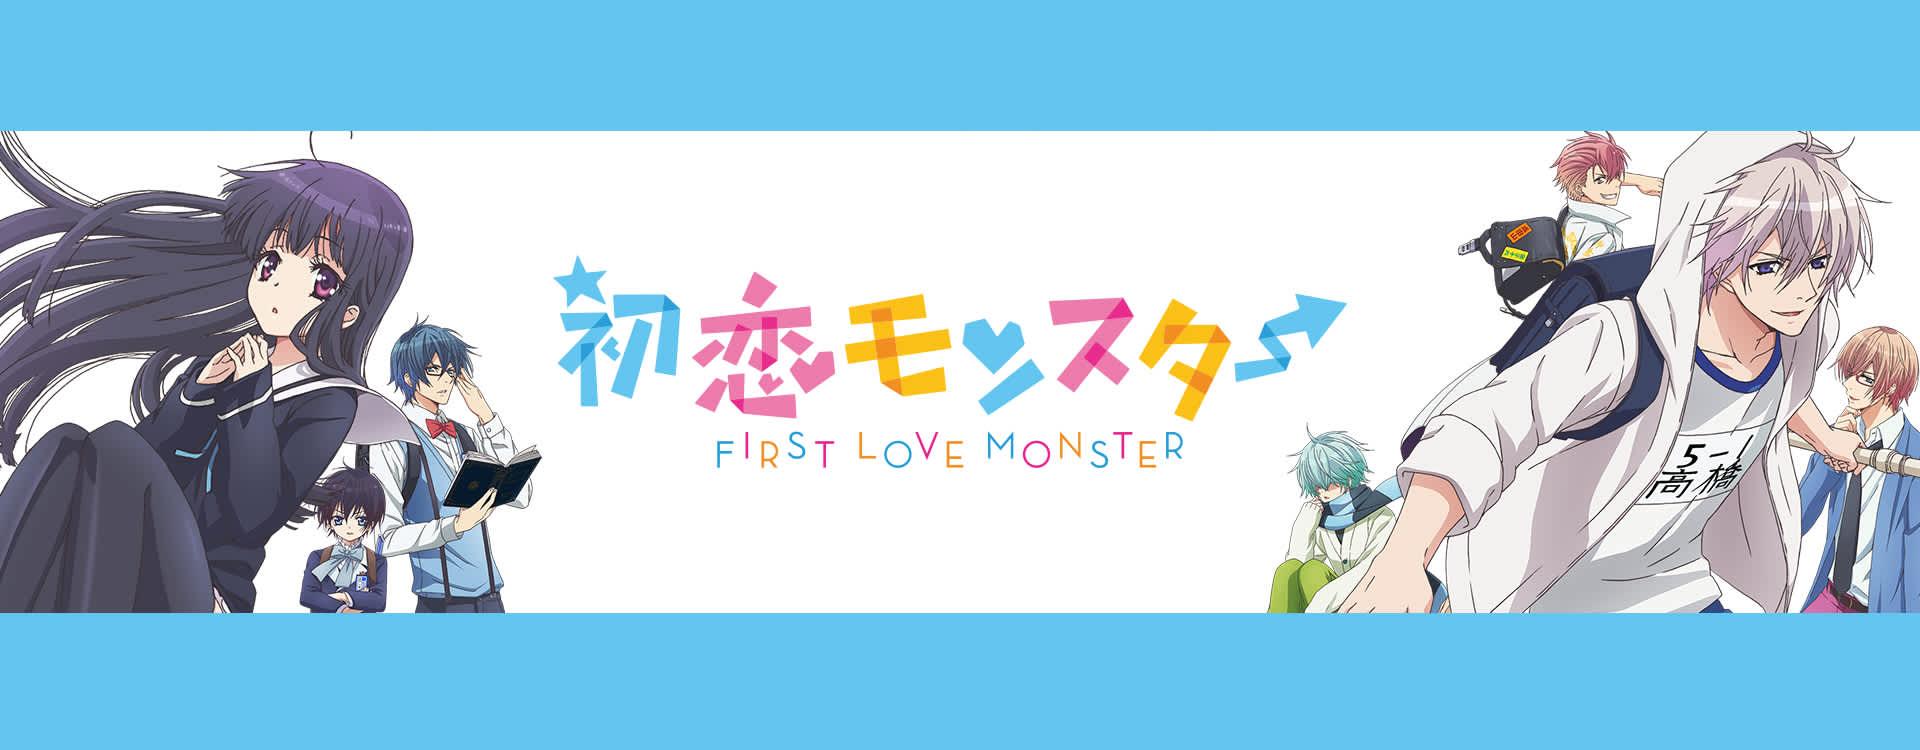 First Love Monster